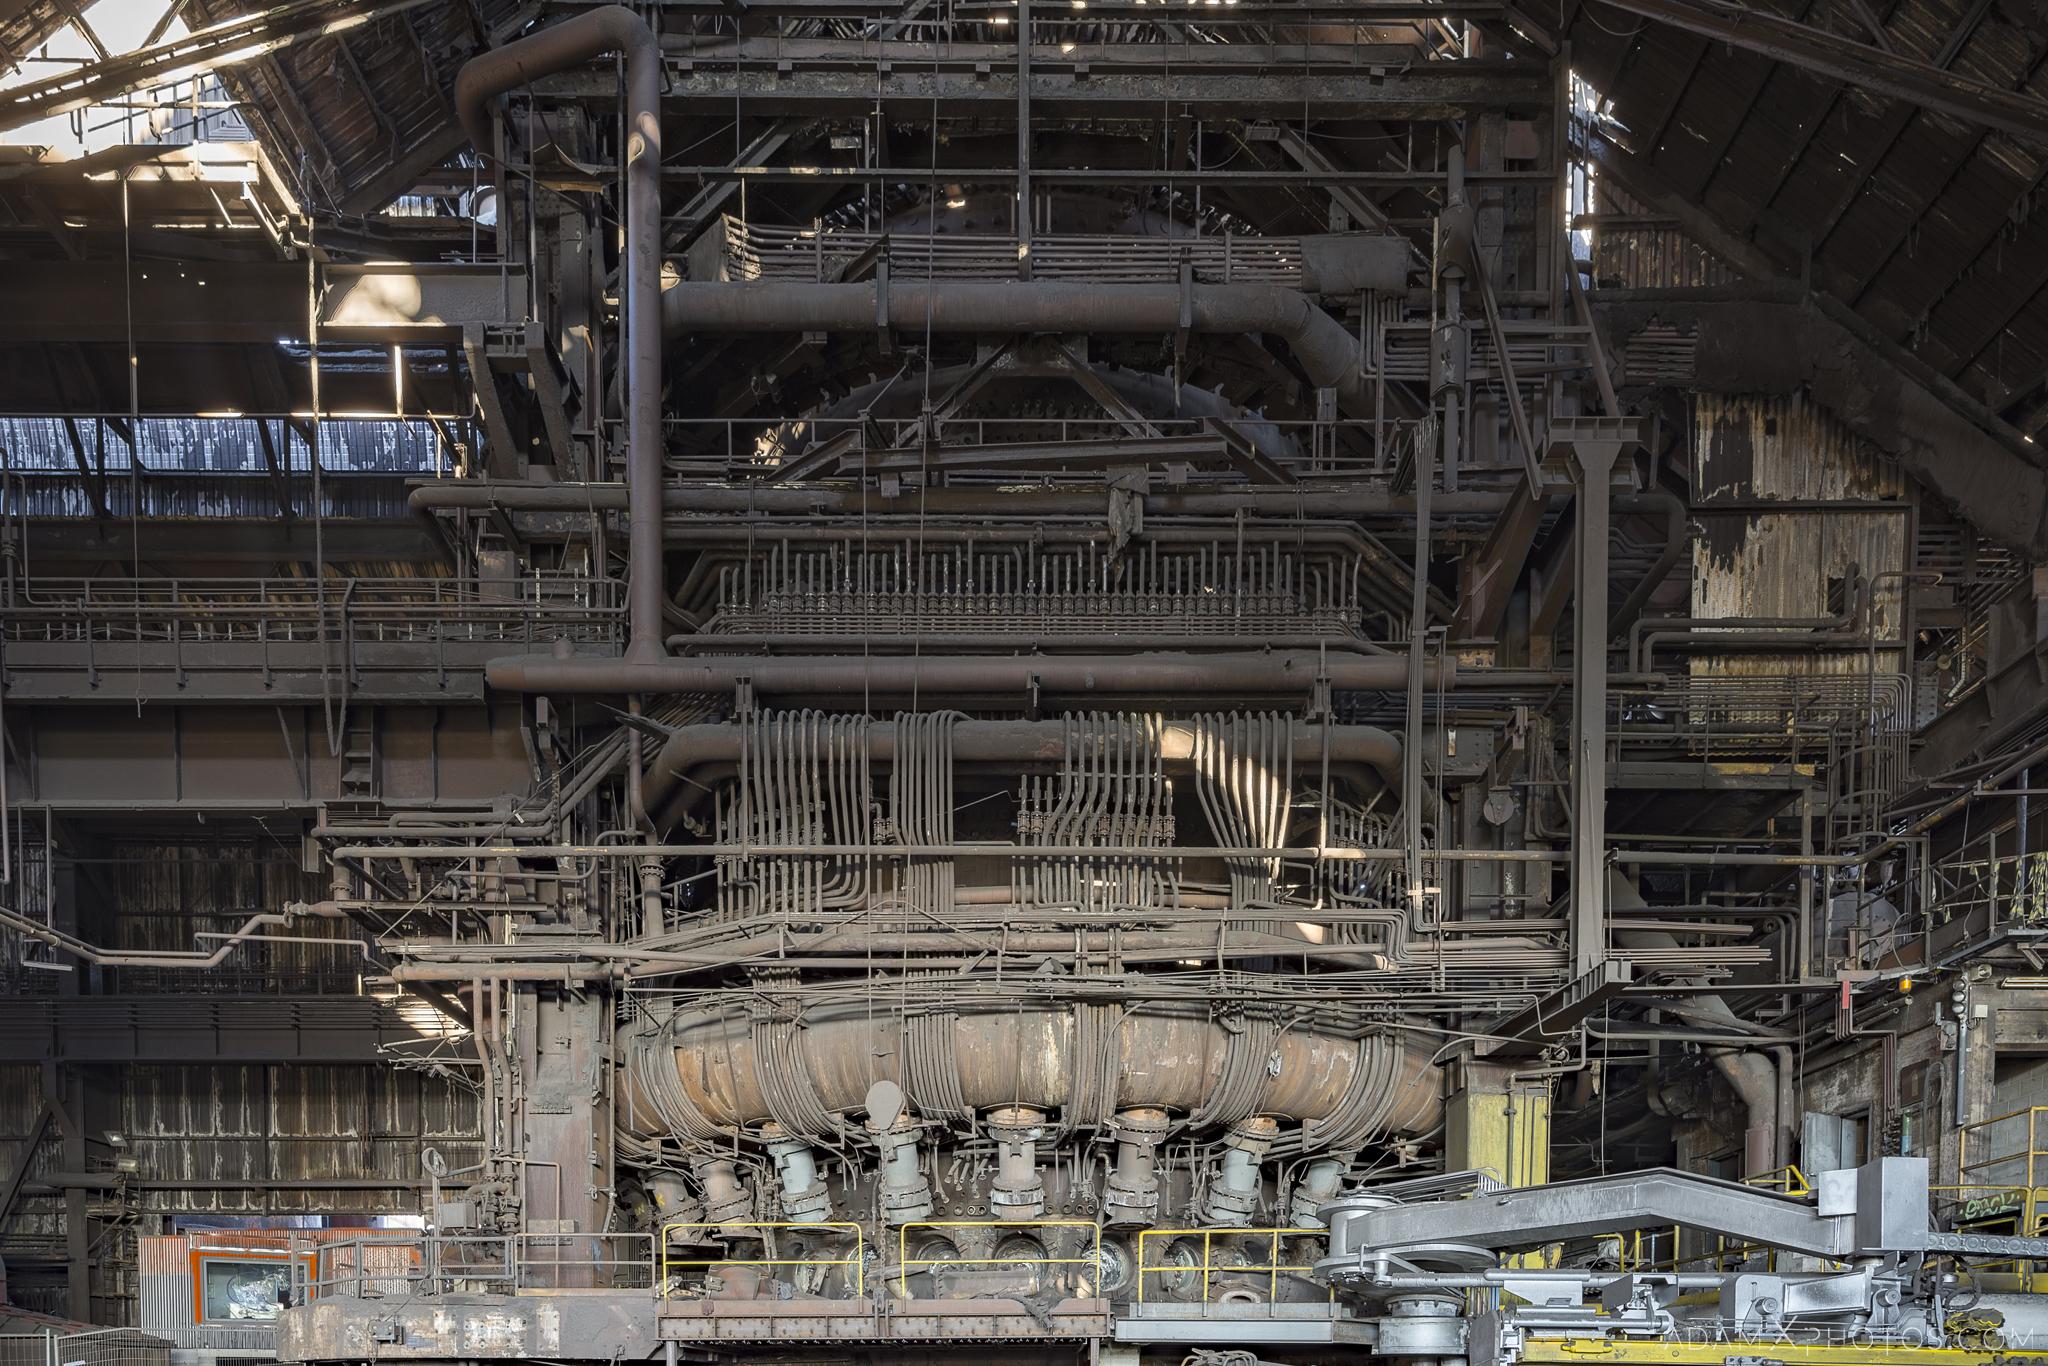 Haut Fourneau B HFB Blast Furnace Steelworks Adam X Urban Exploration Belgium Access 2017 Abandoned decay lost forgotten derelict location creepy haunting eerie